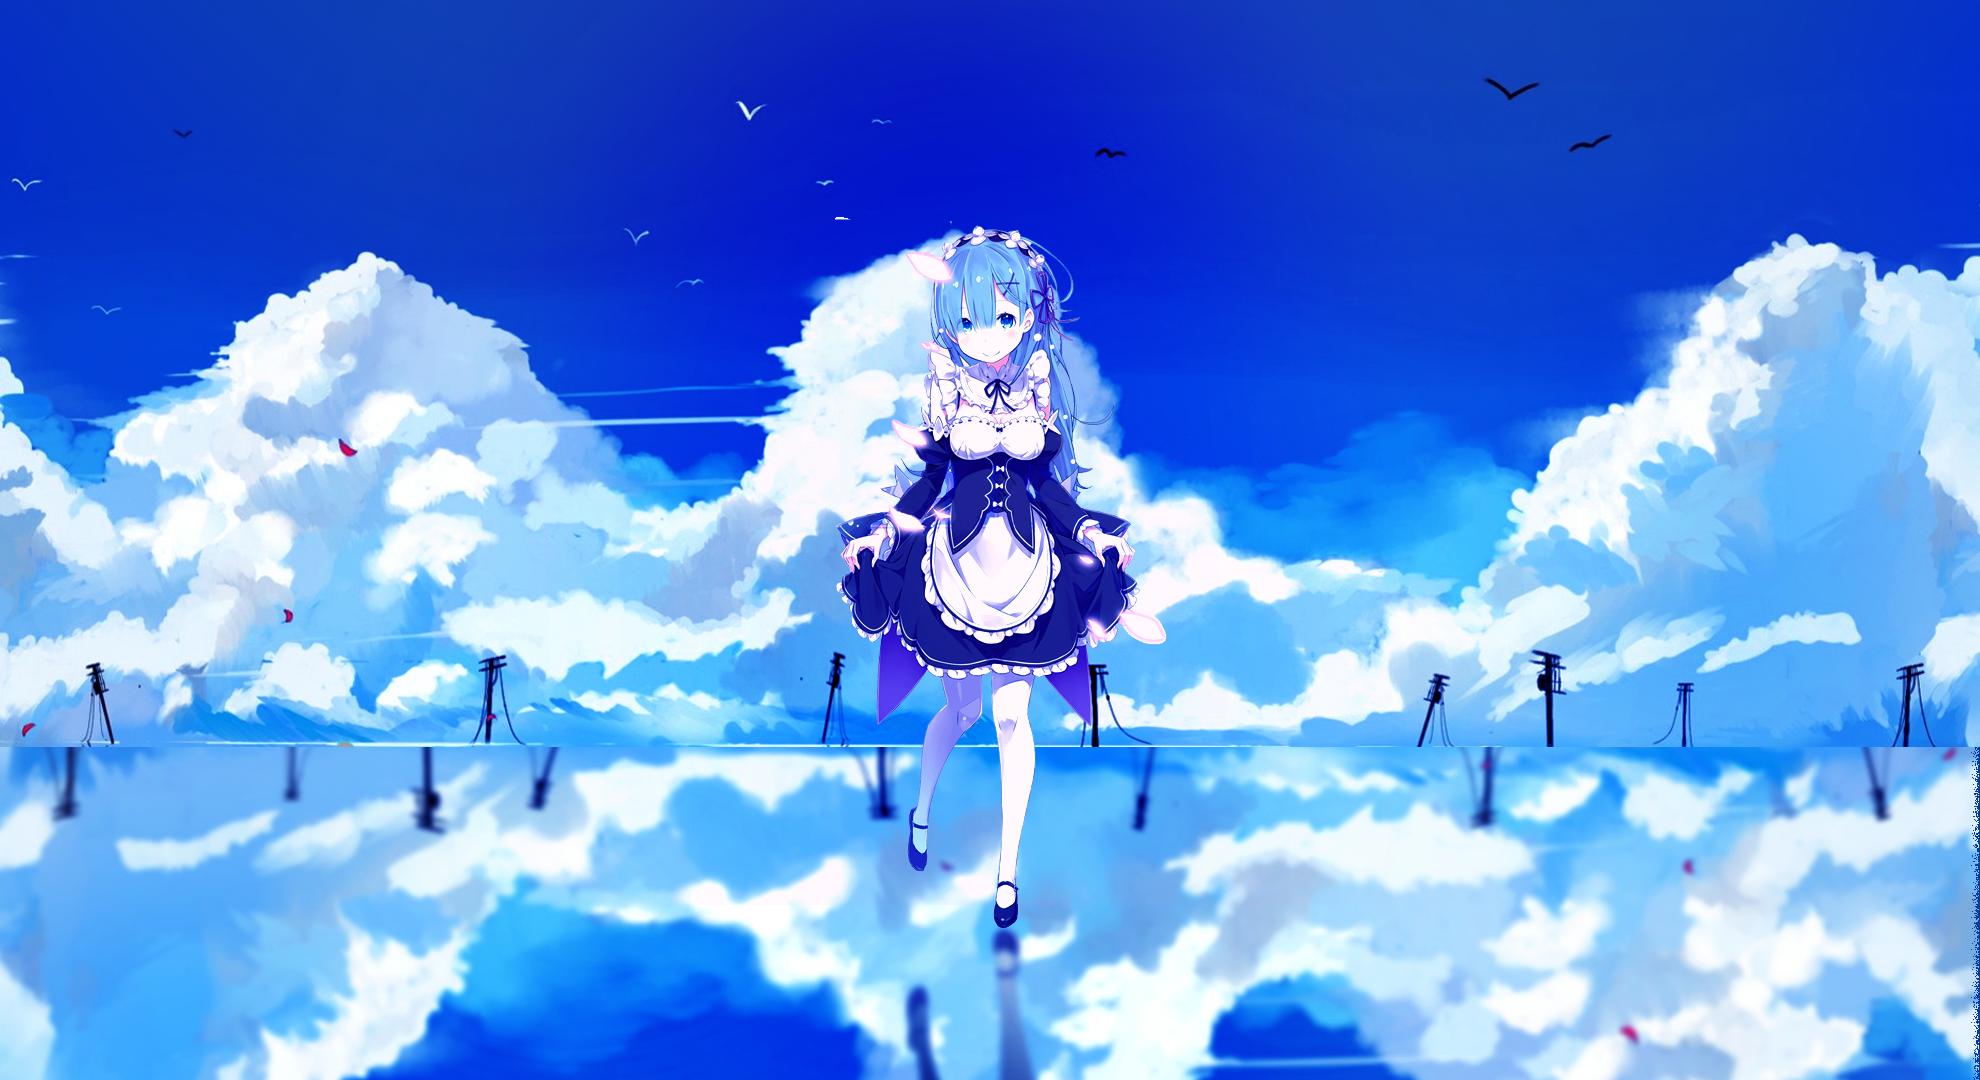 Wallpaper Sunlight Anime Girls Reflection Sky Winter Blue Re Zero Kara Hajimeru Isekai Seikatsu Rem Re Zero Atmosphere Cloud Flower Computer Wallpaper 1980x1080 Kejsirajbek 5645 Hd Wallpapers Wallhere